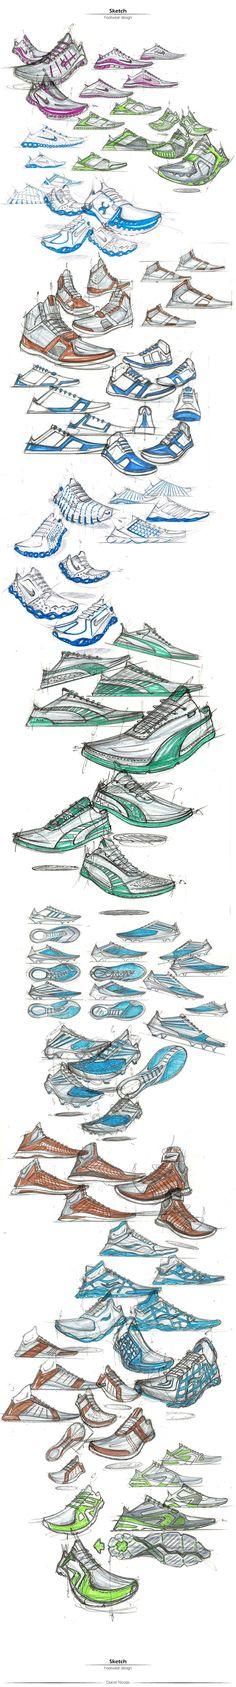 Footwear Design: Hand Sketch on Behance